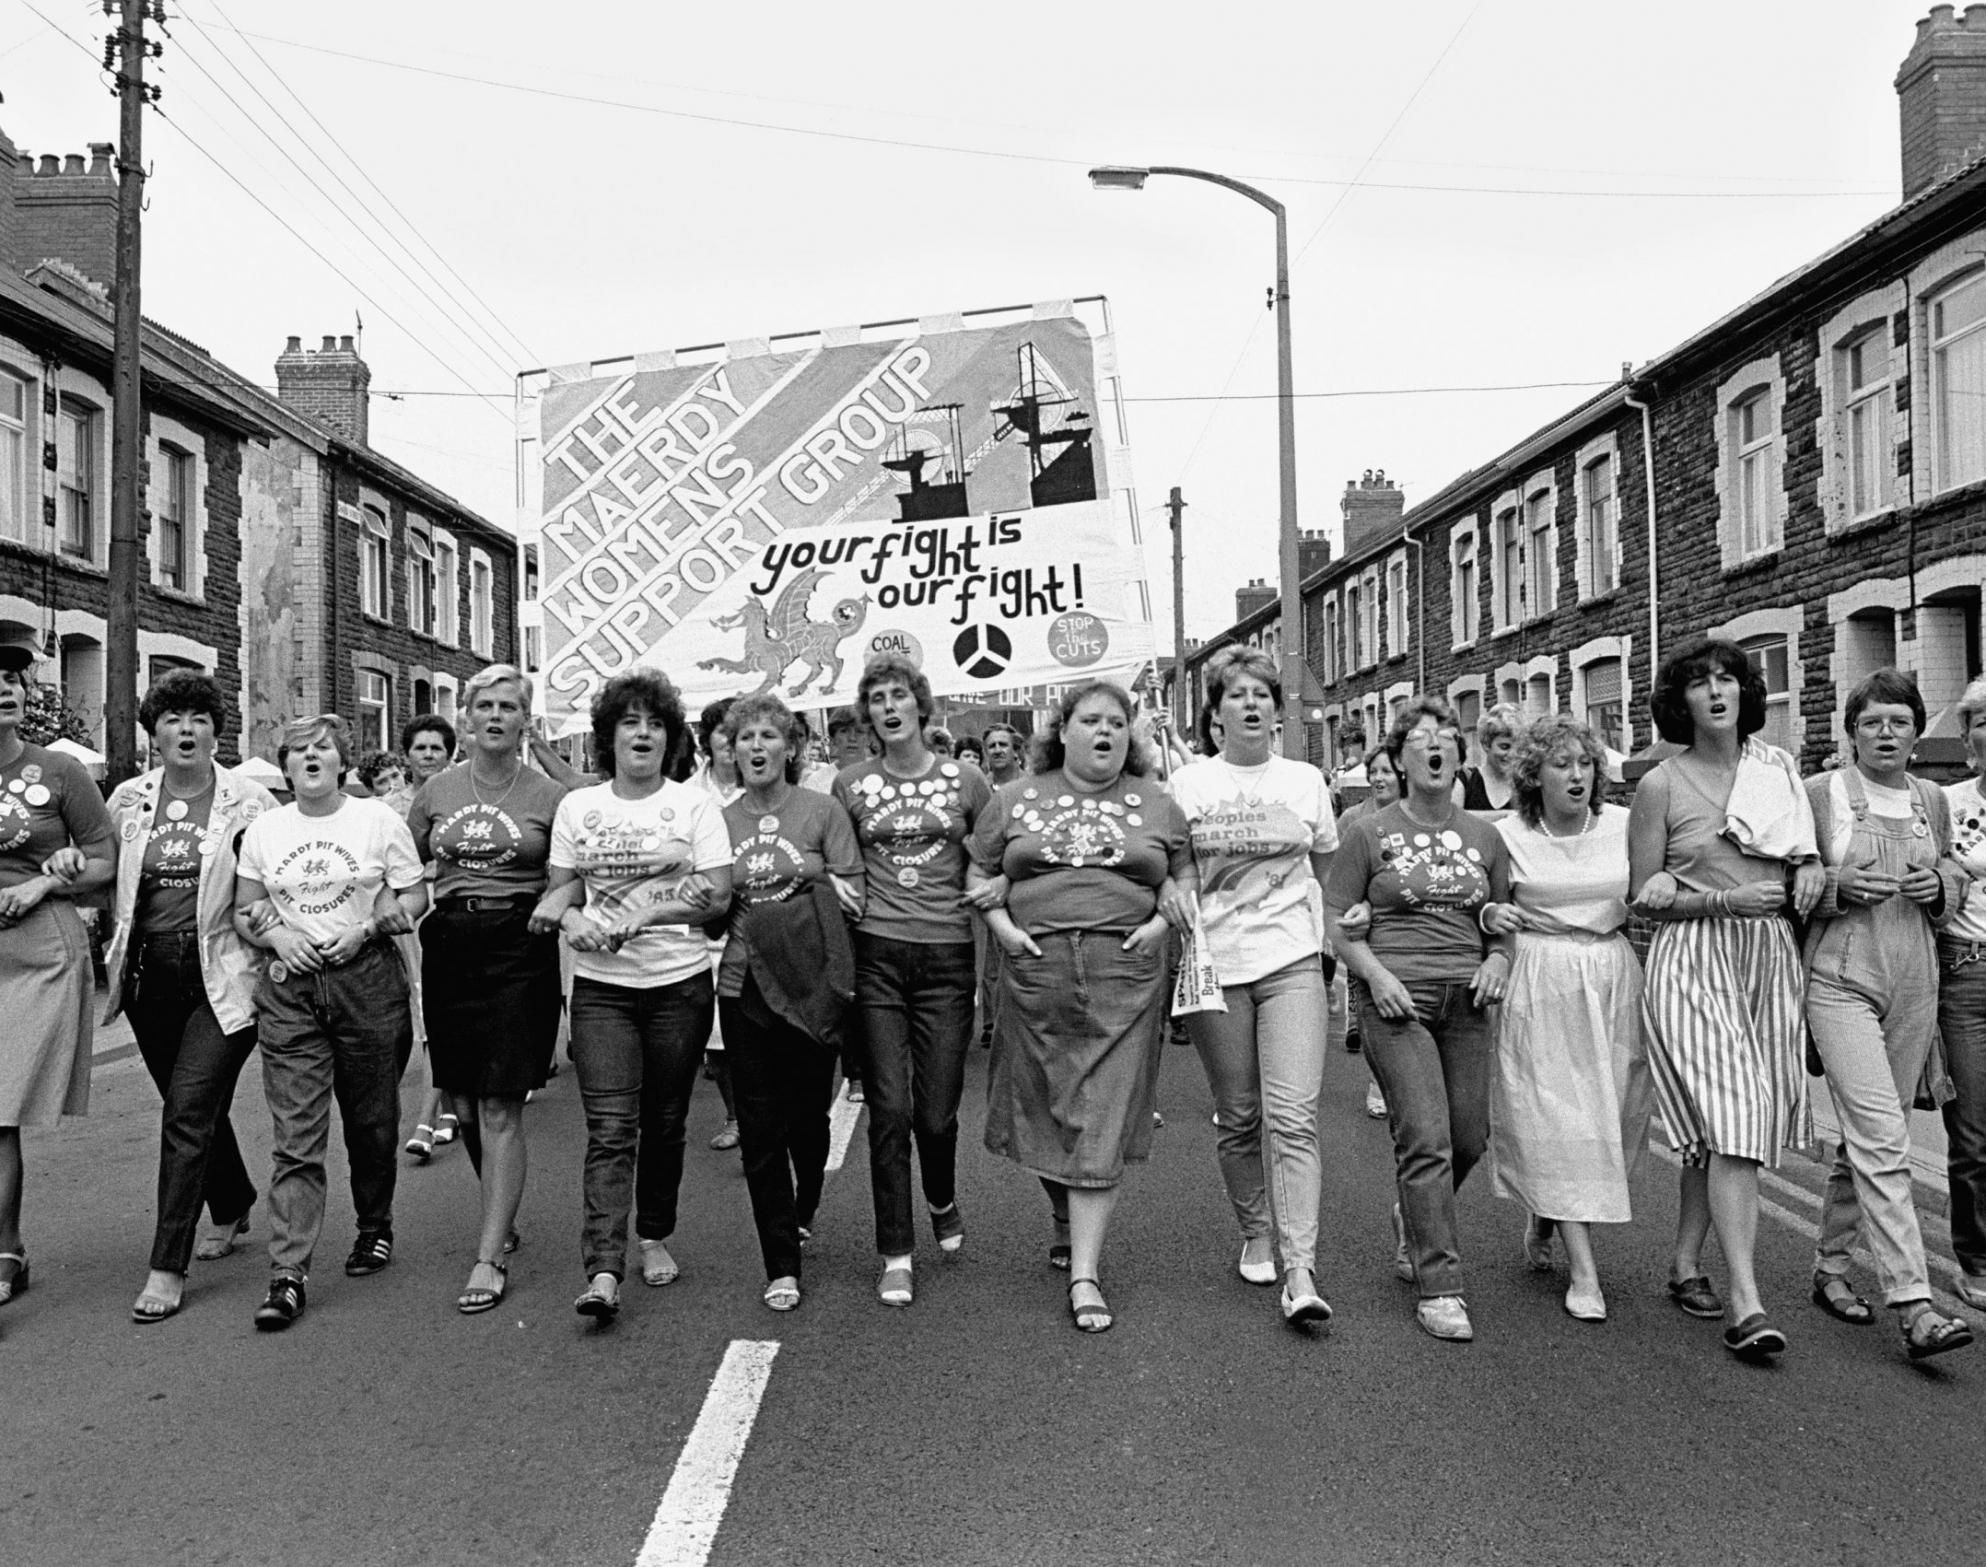 Maerdy Women's Support Group. Copyright Martin Shakeshaft